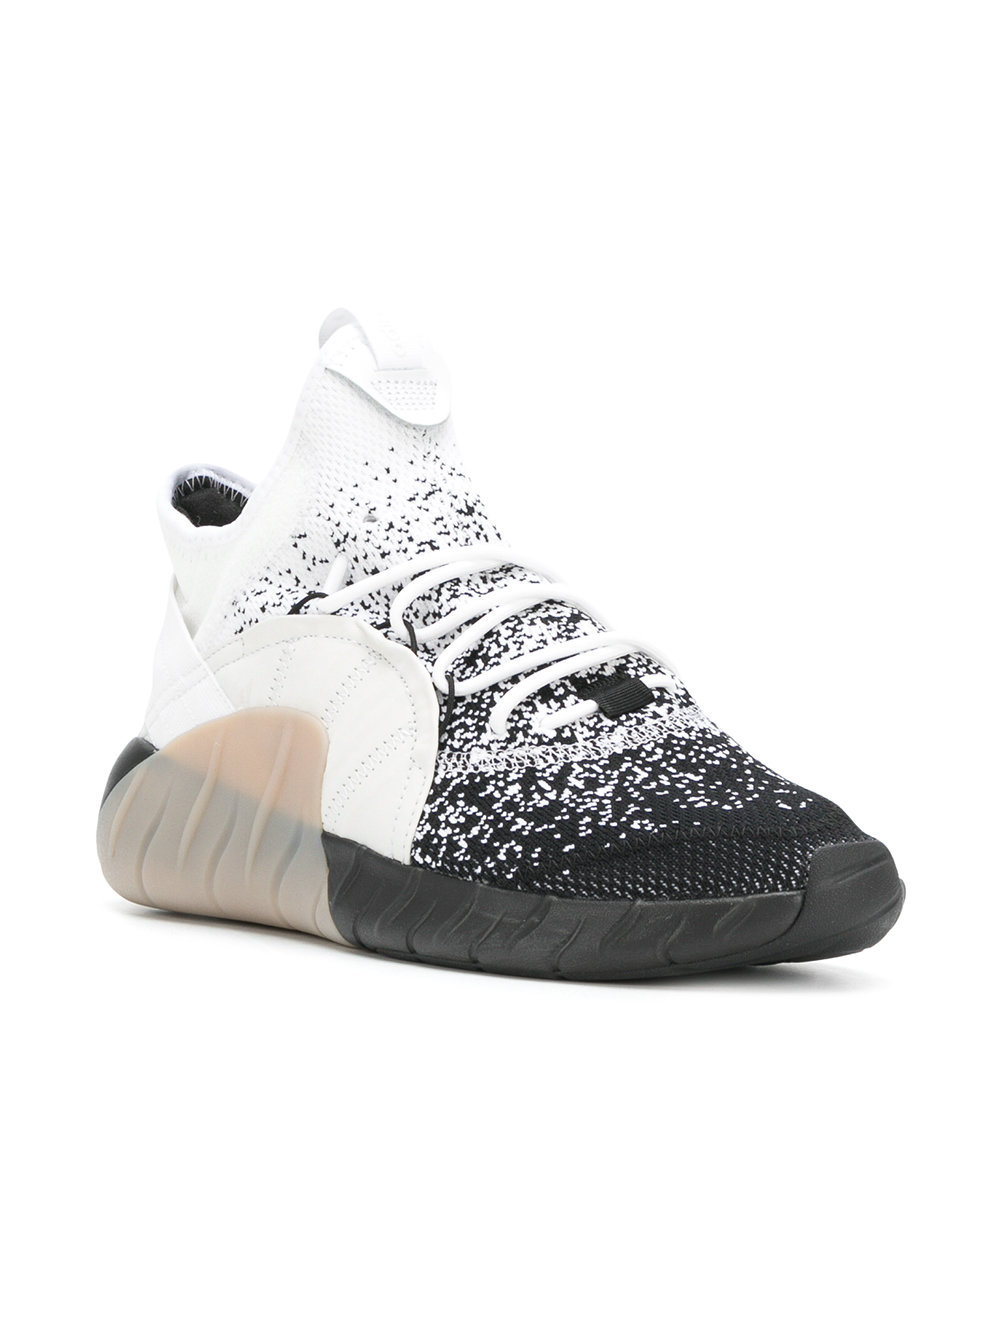 the best attitude b4601 c4ddd $185, adidas Originals Tubular Rise Sneakers